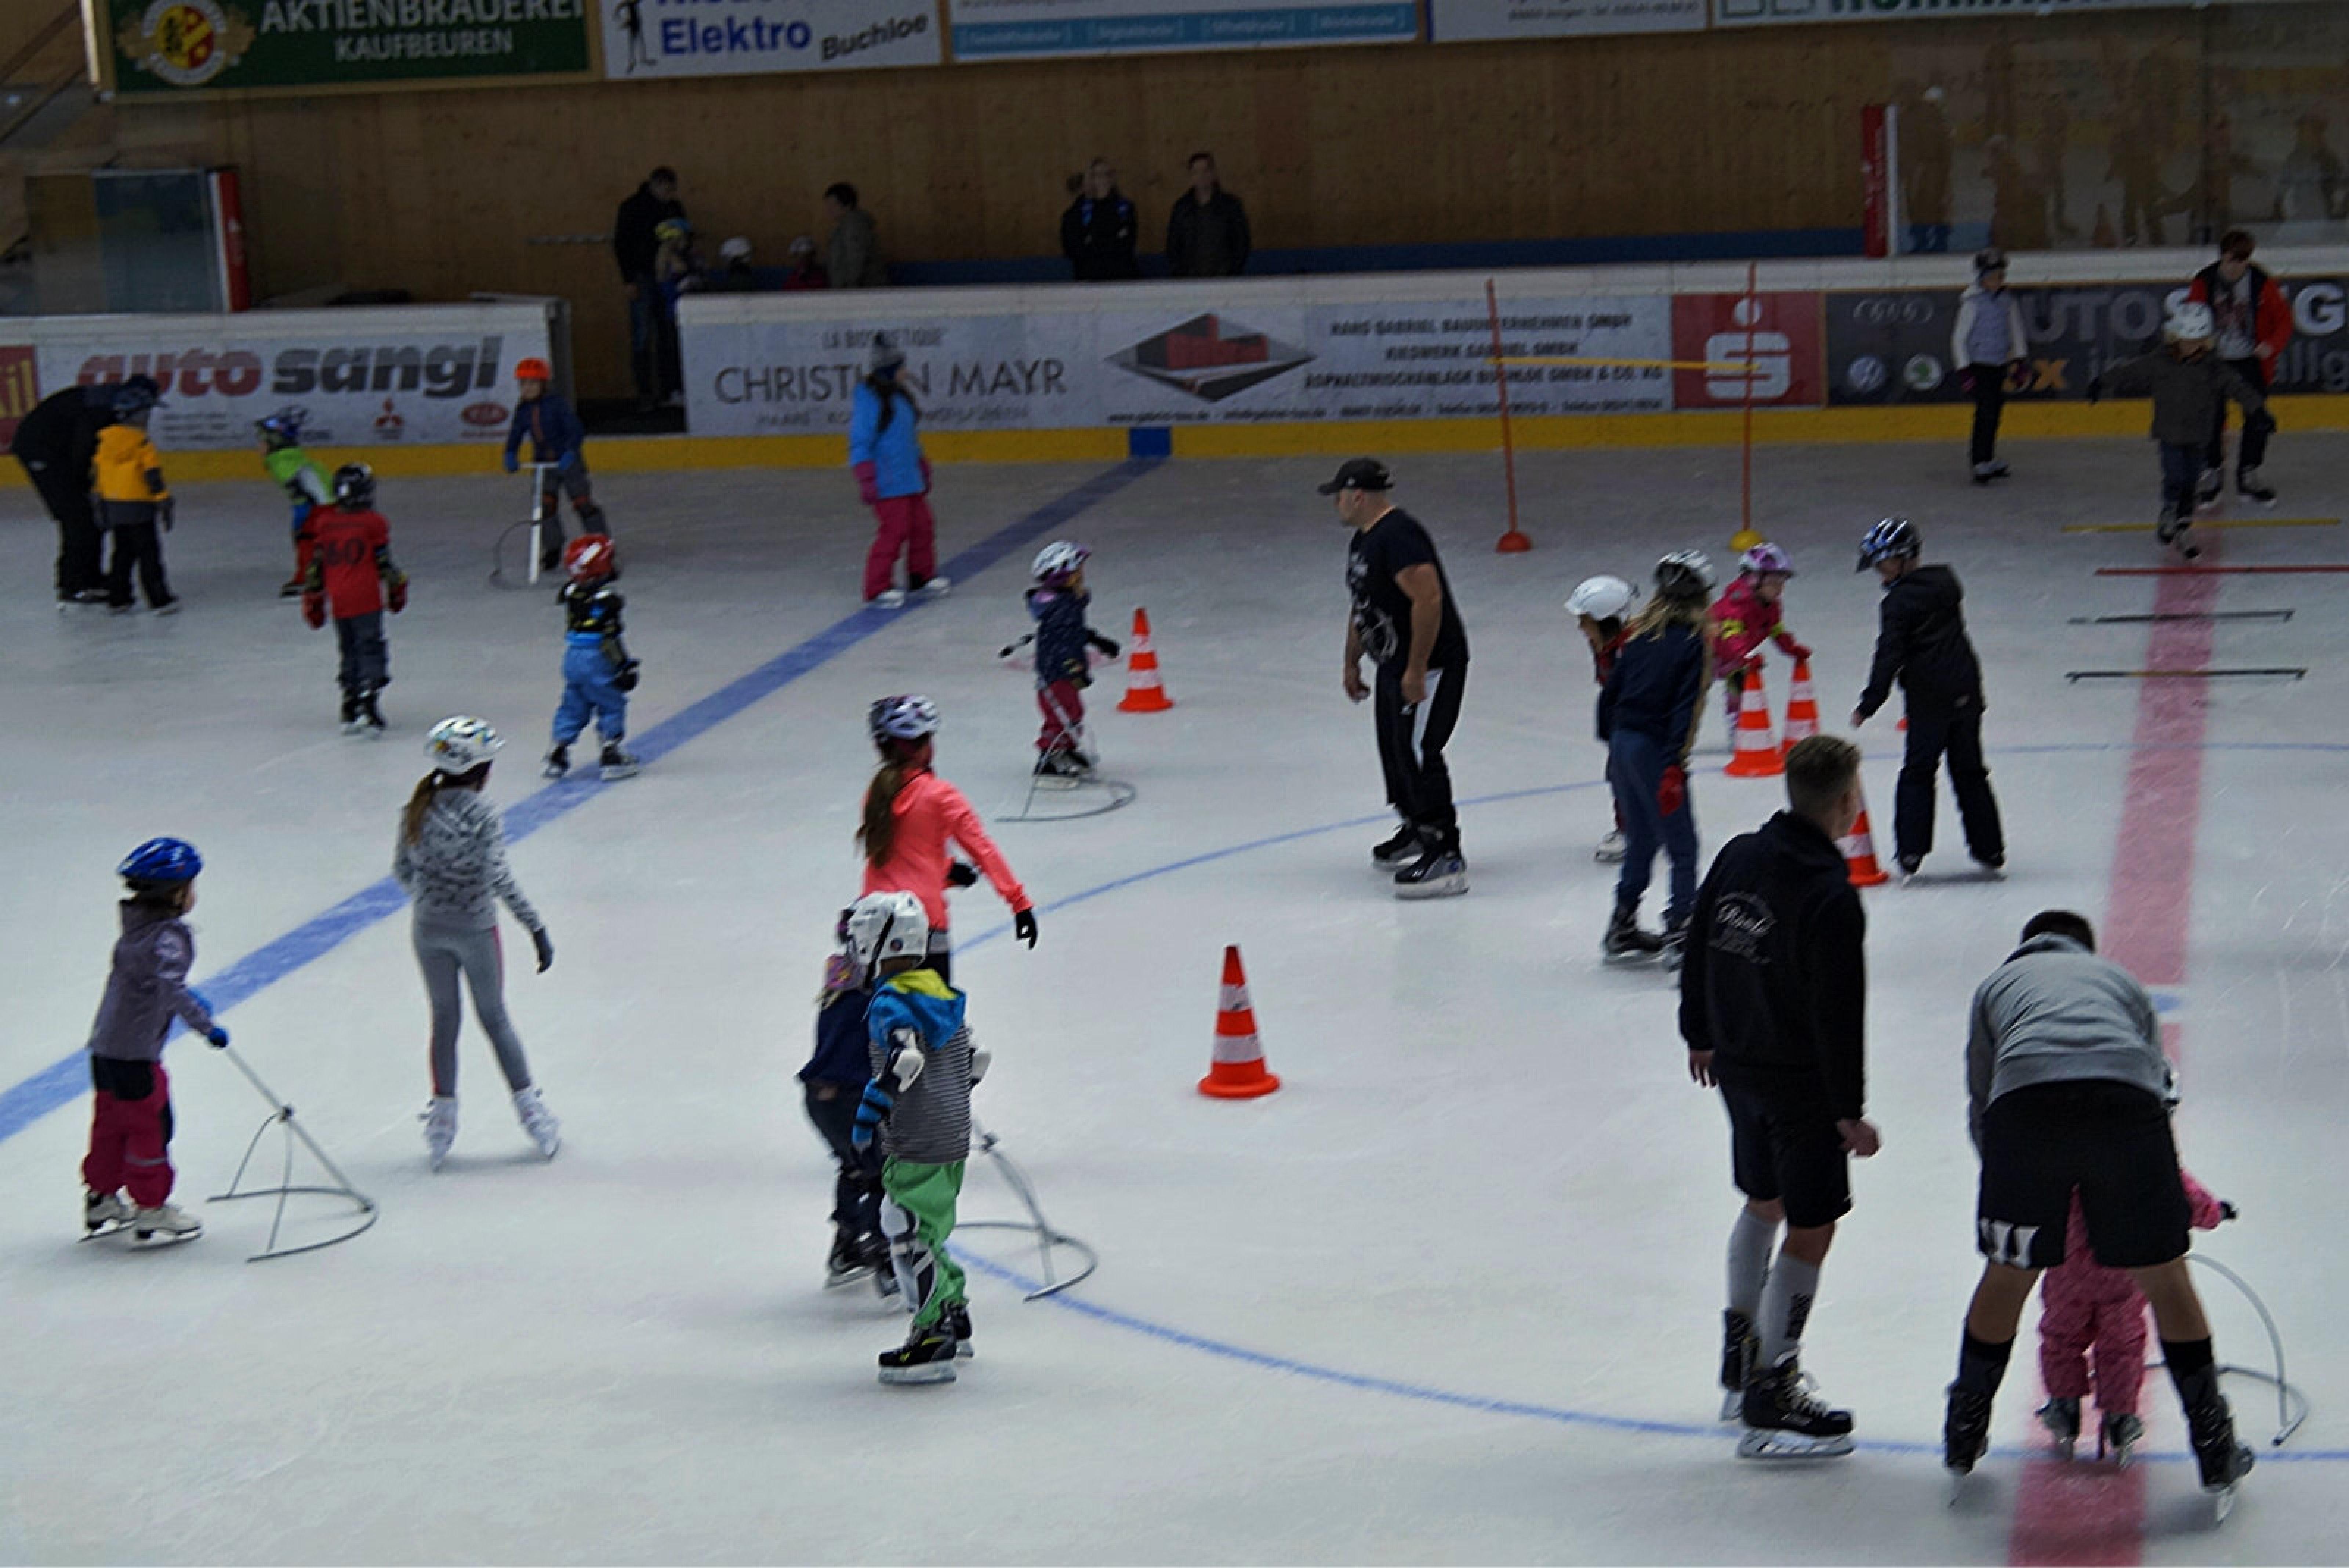 Kids on Ice Day 15.09 (3)